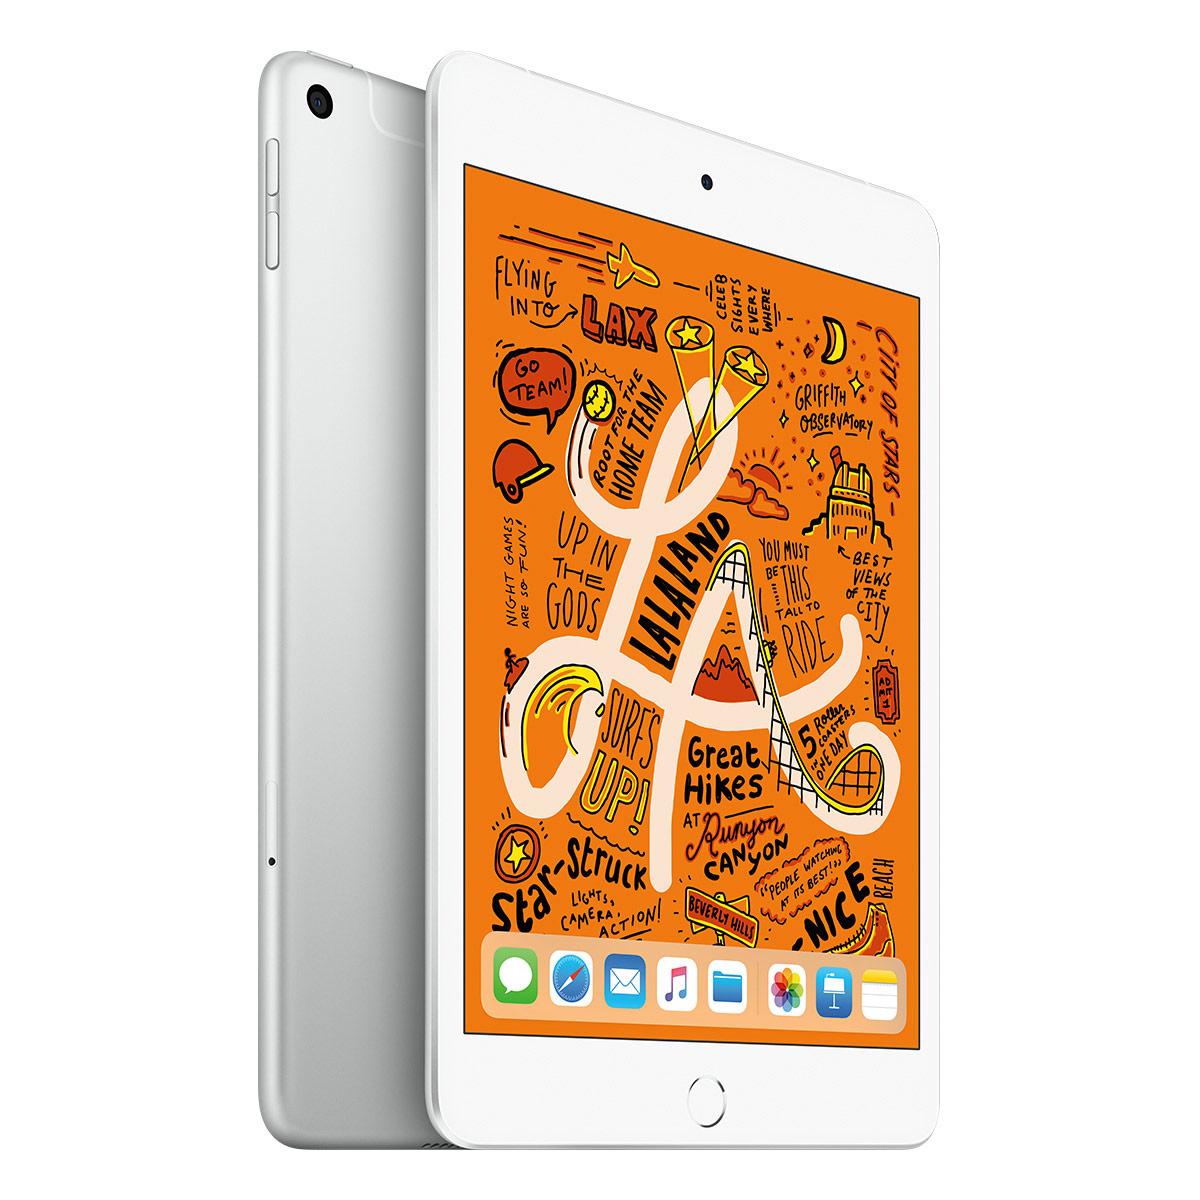 Education Apple iPad mini 64GB WiFi + Cellular - Silver